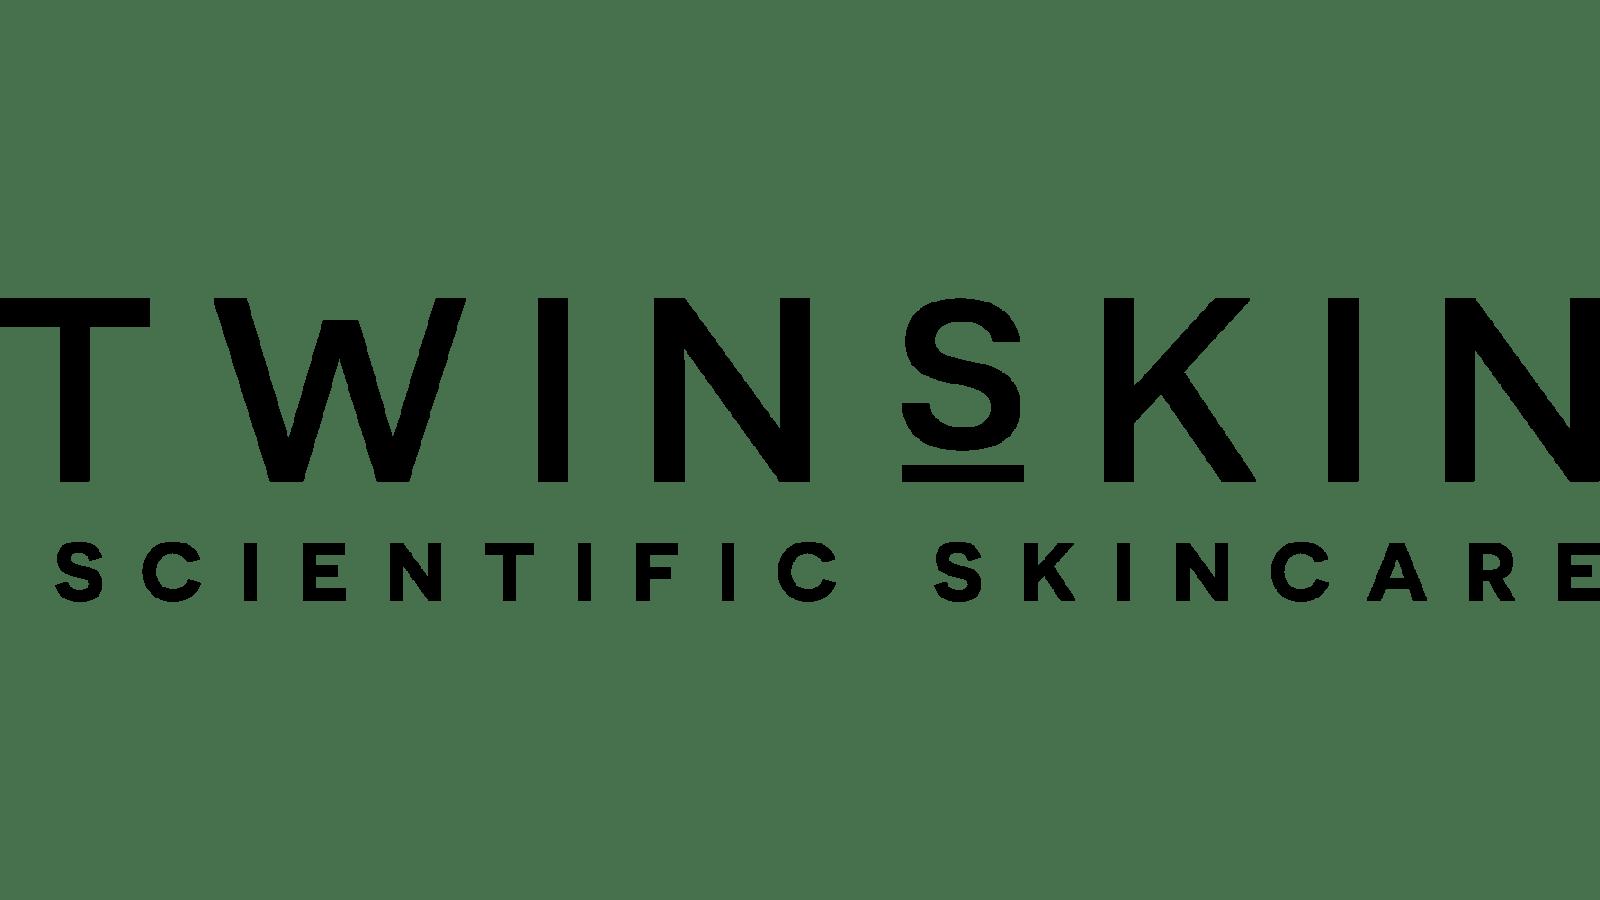 Twins Skin